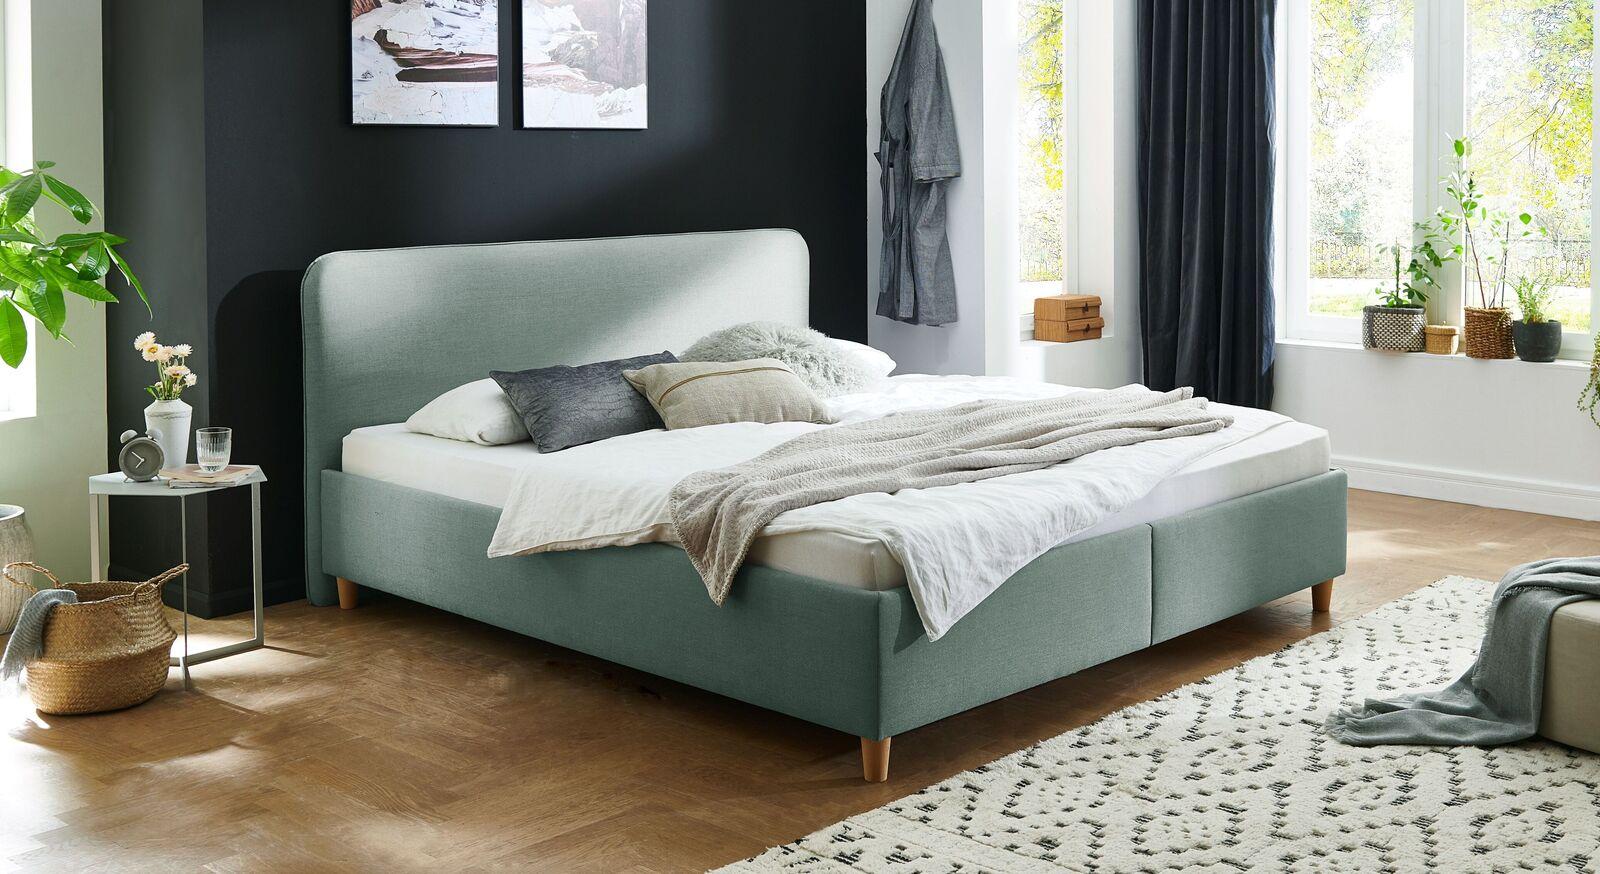 Bett Kannur mit geräumigem Bettkasten